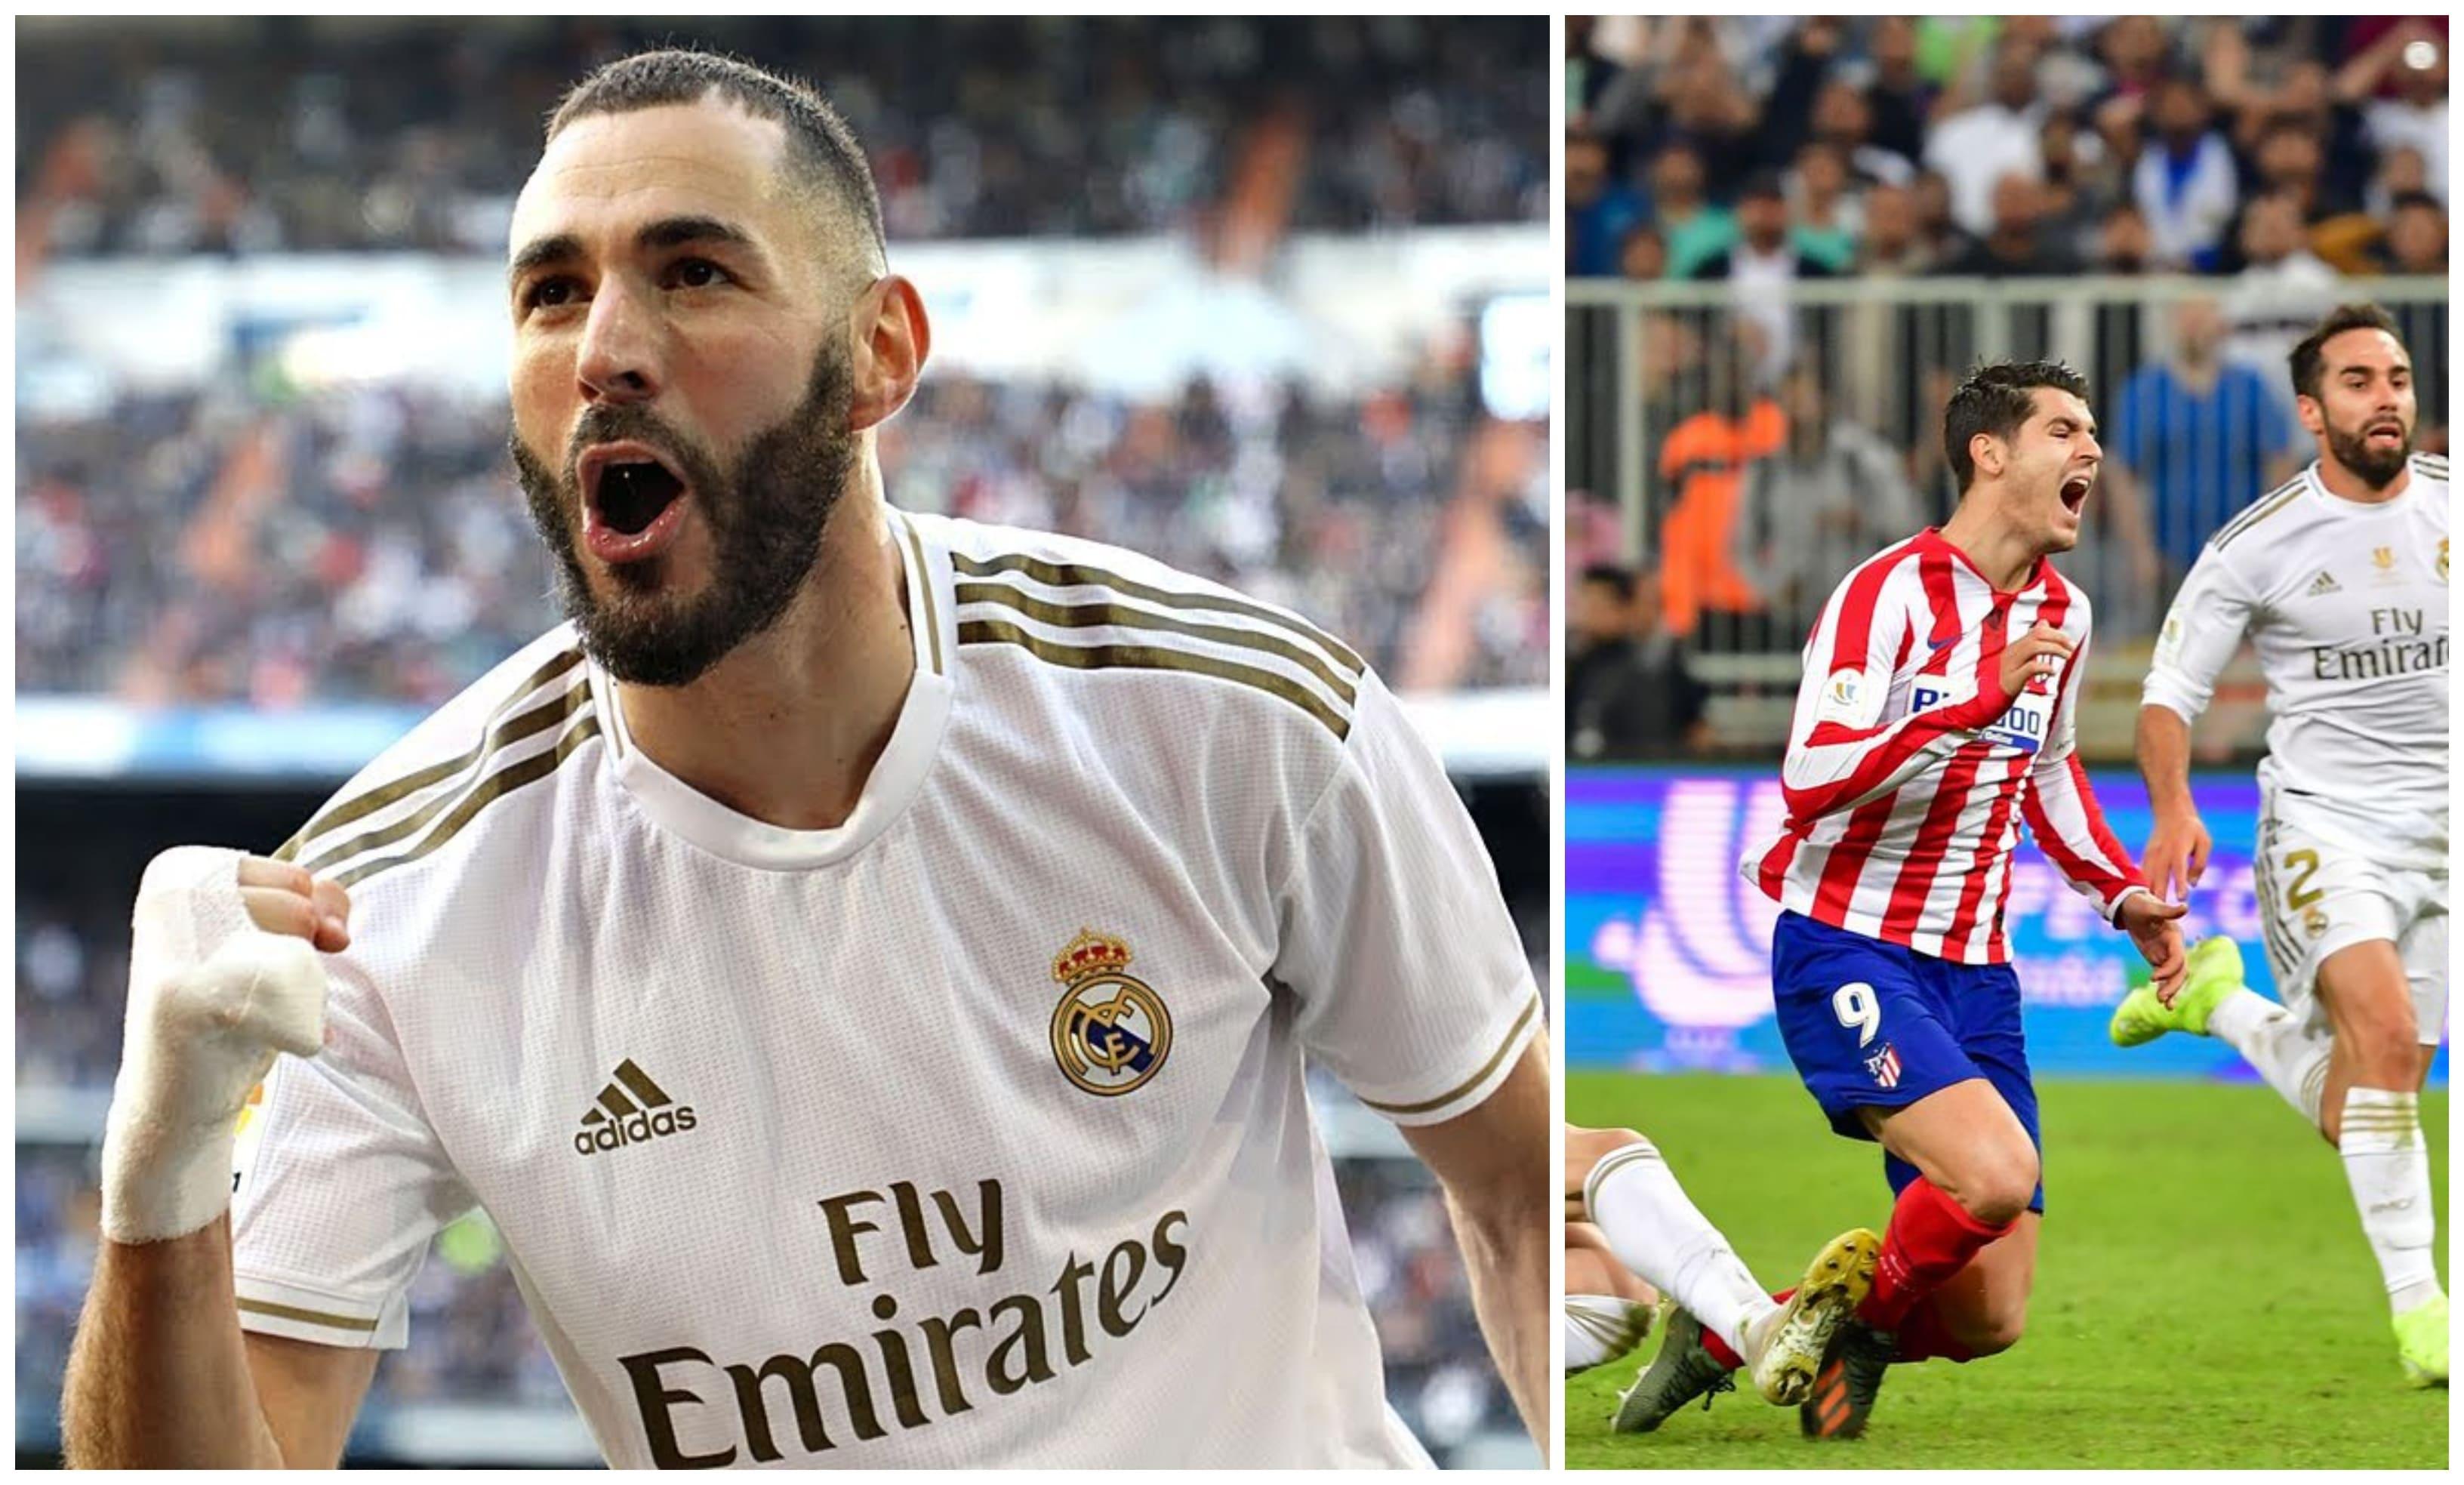 REAL MADRID VS ATLETICO MADRID ROUND-UP & HIGHLIGHTS: LA LIGA MATCH ON 01.02.2020